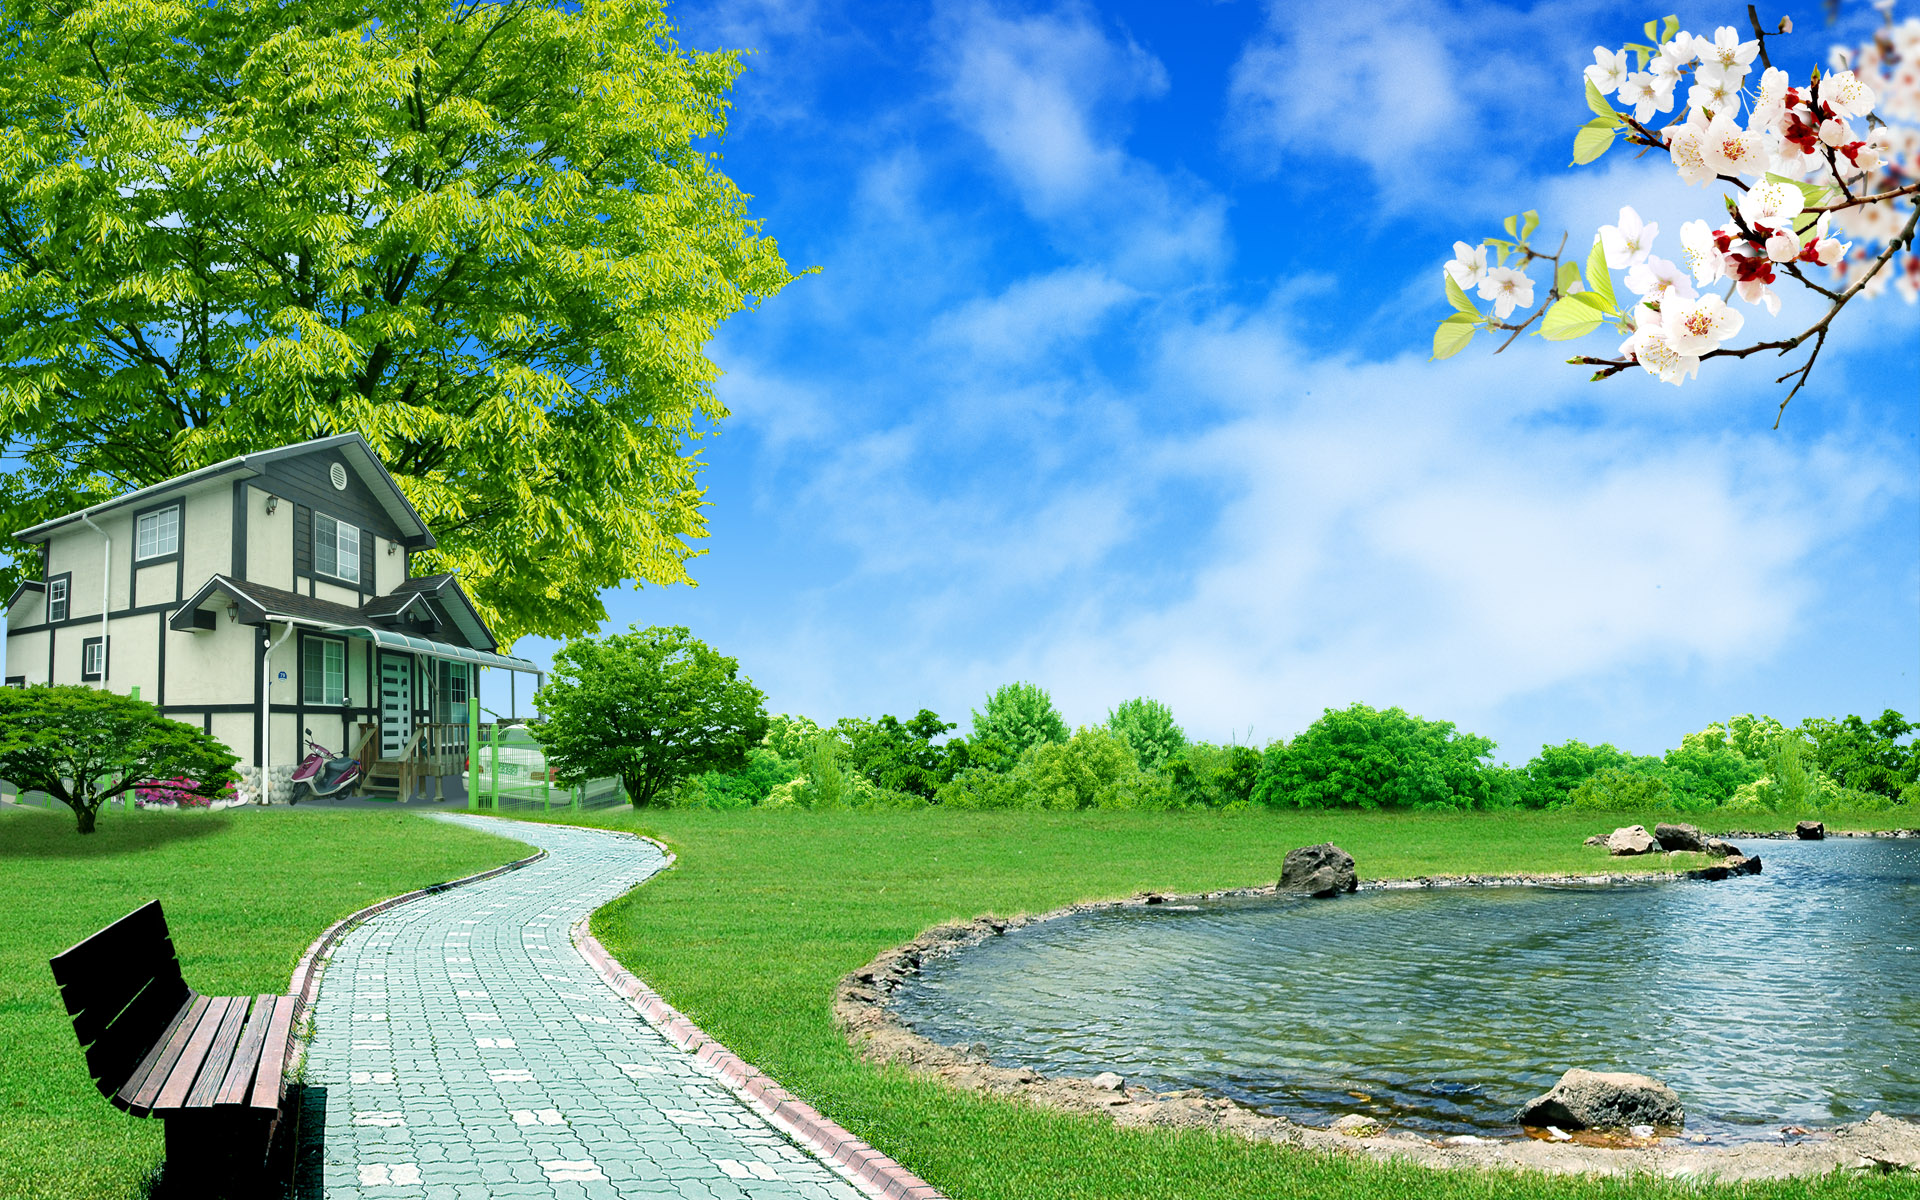 summer fantasy landscape for desktop wallpaper Wallpapers   HD 1920x1200